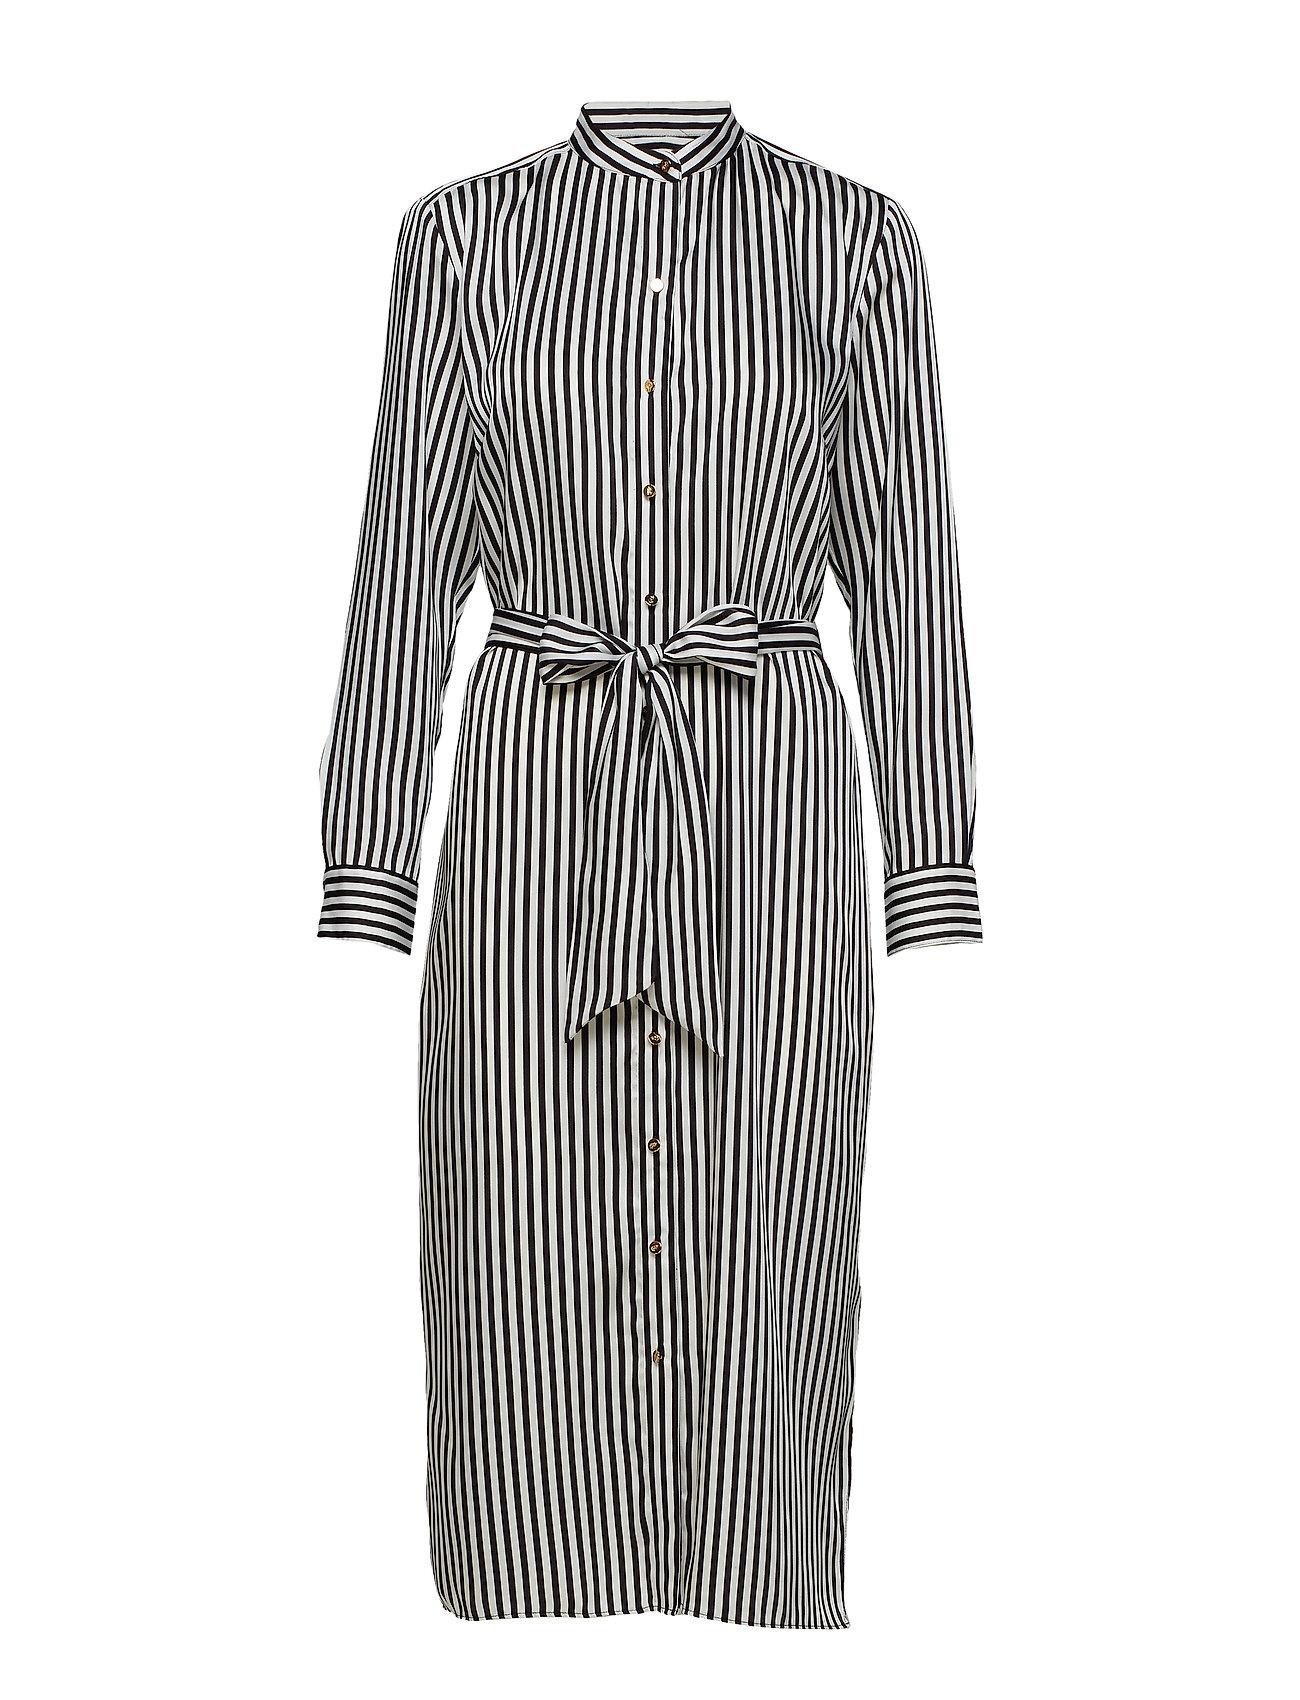 7327df7a64f Striped Twill Shirtdress (Silk White polo B) (£155) - Lauren Ralph ...